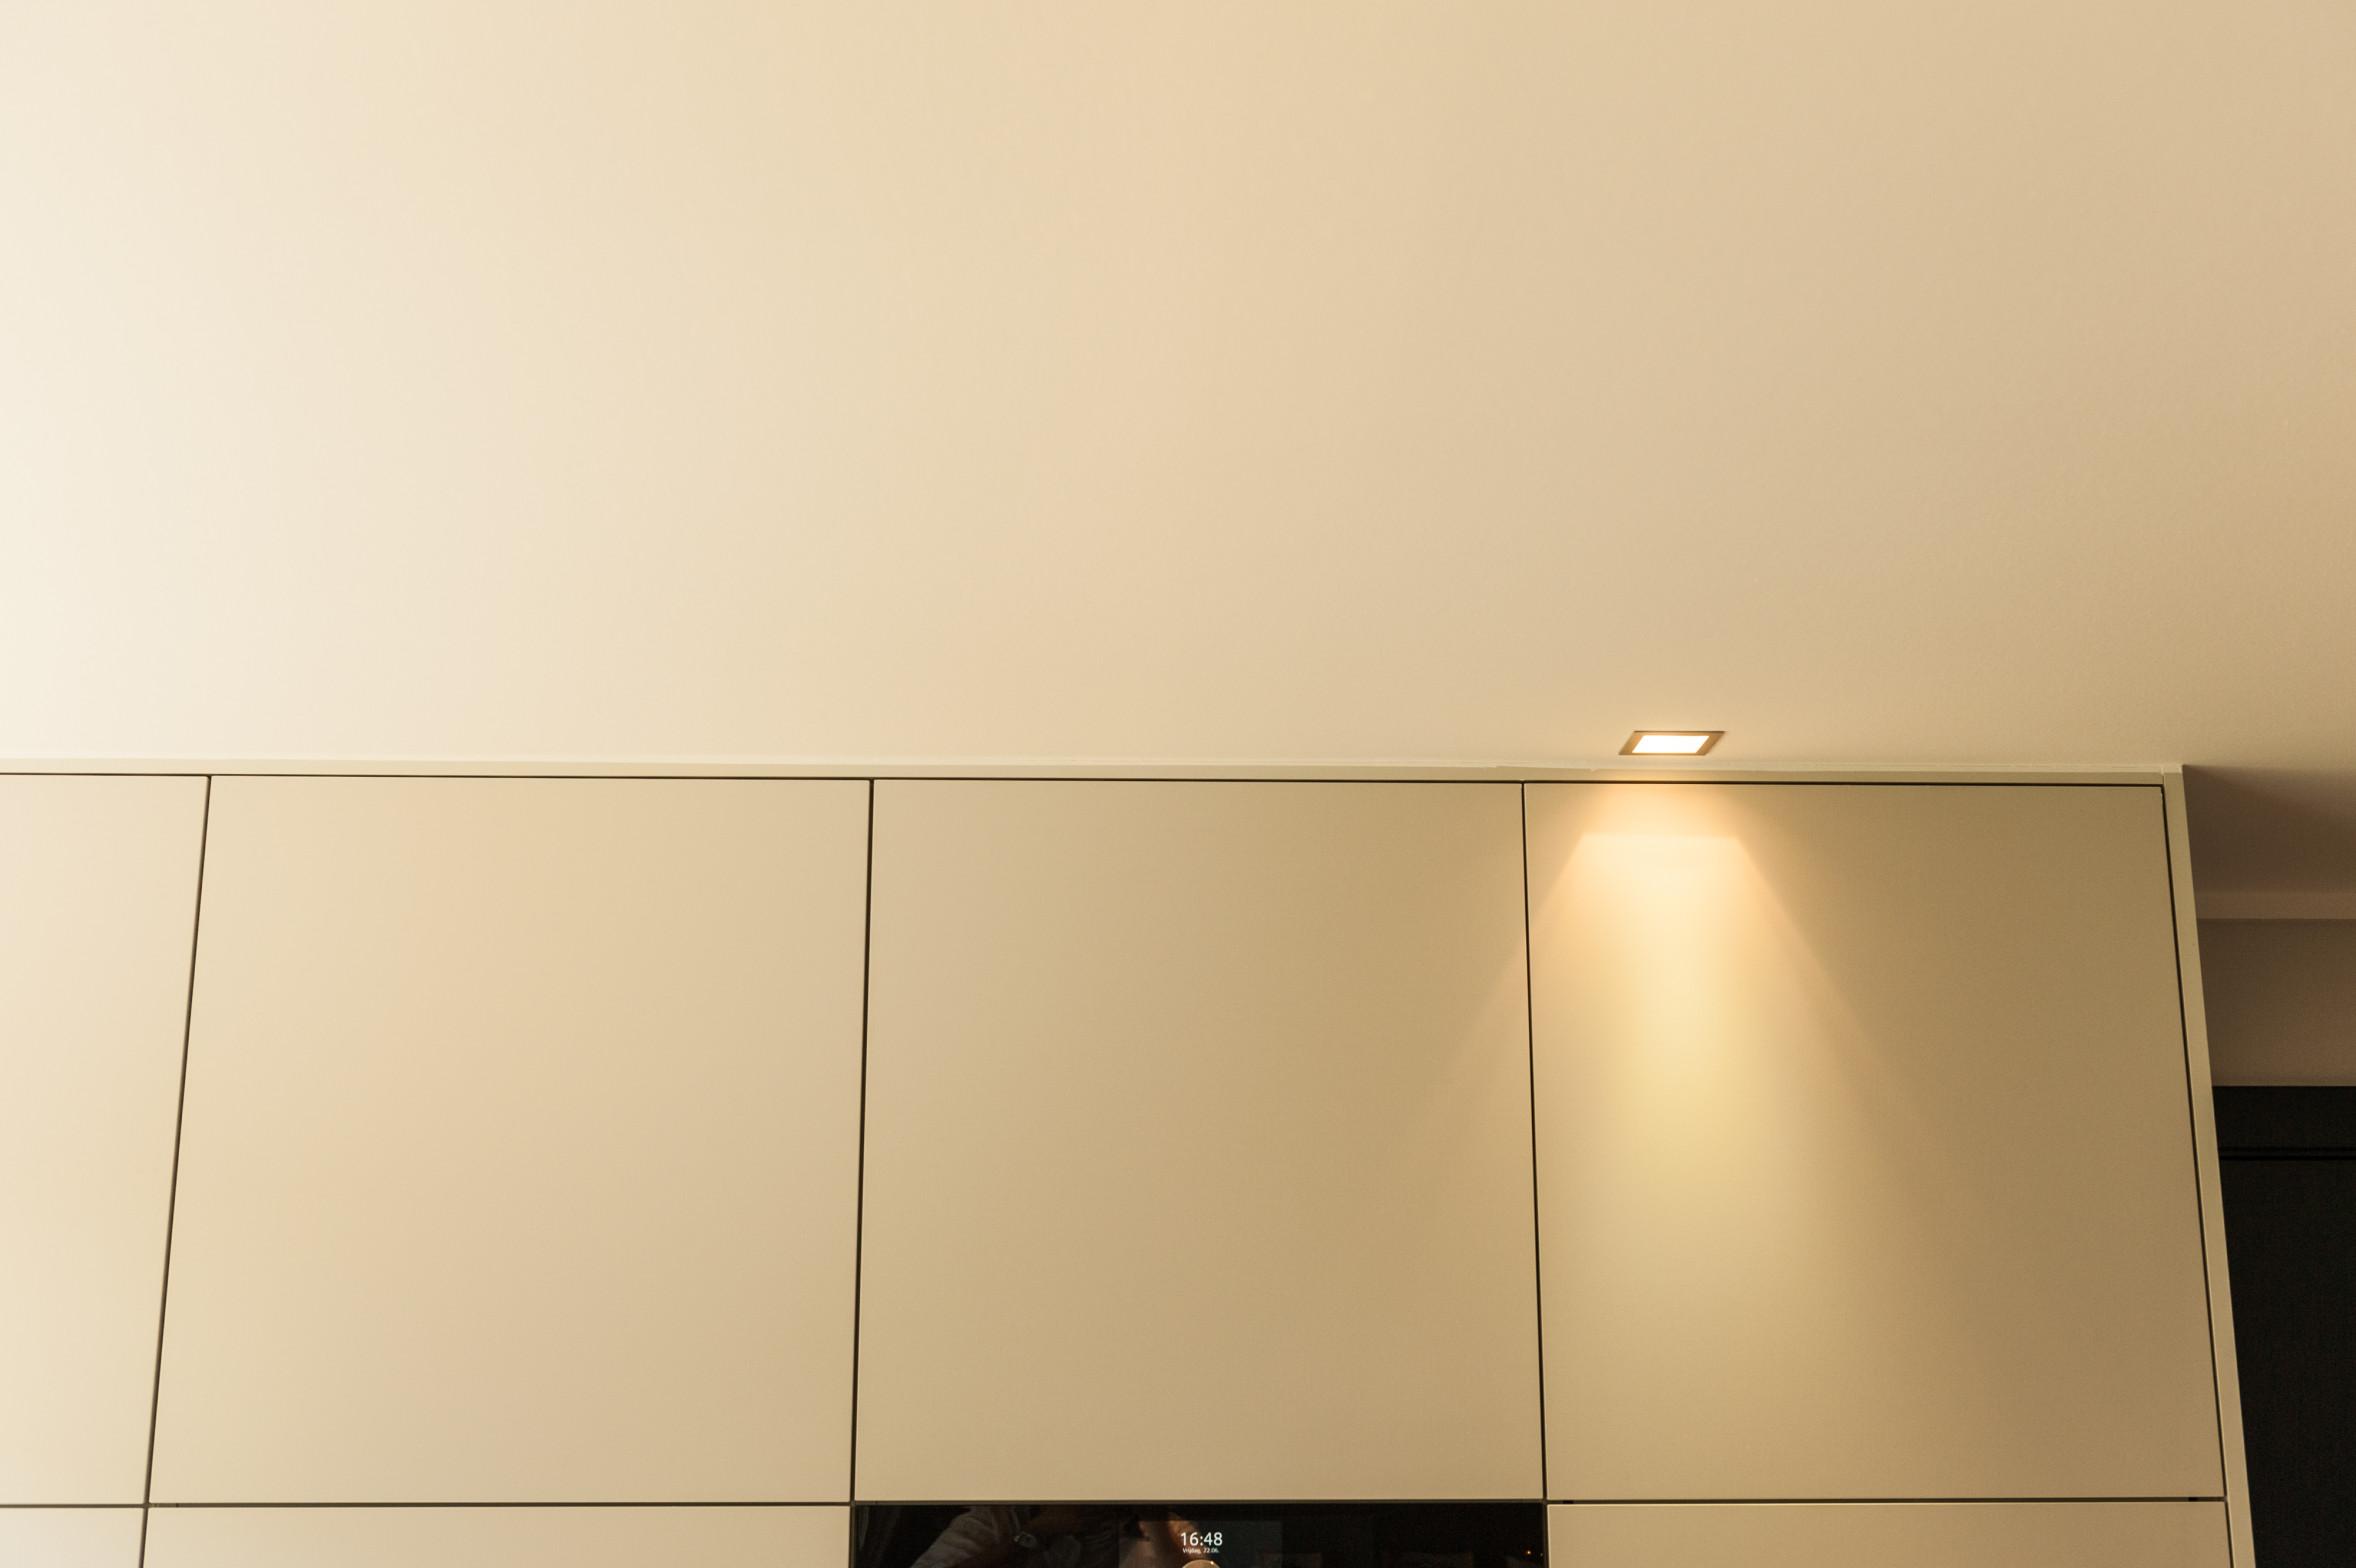 Keuken kasten tot aan plafond boven.jpg